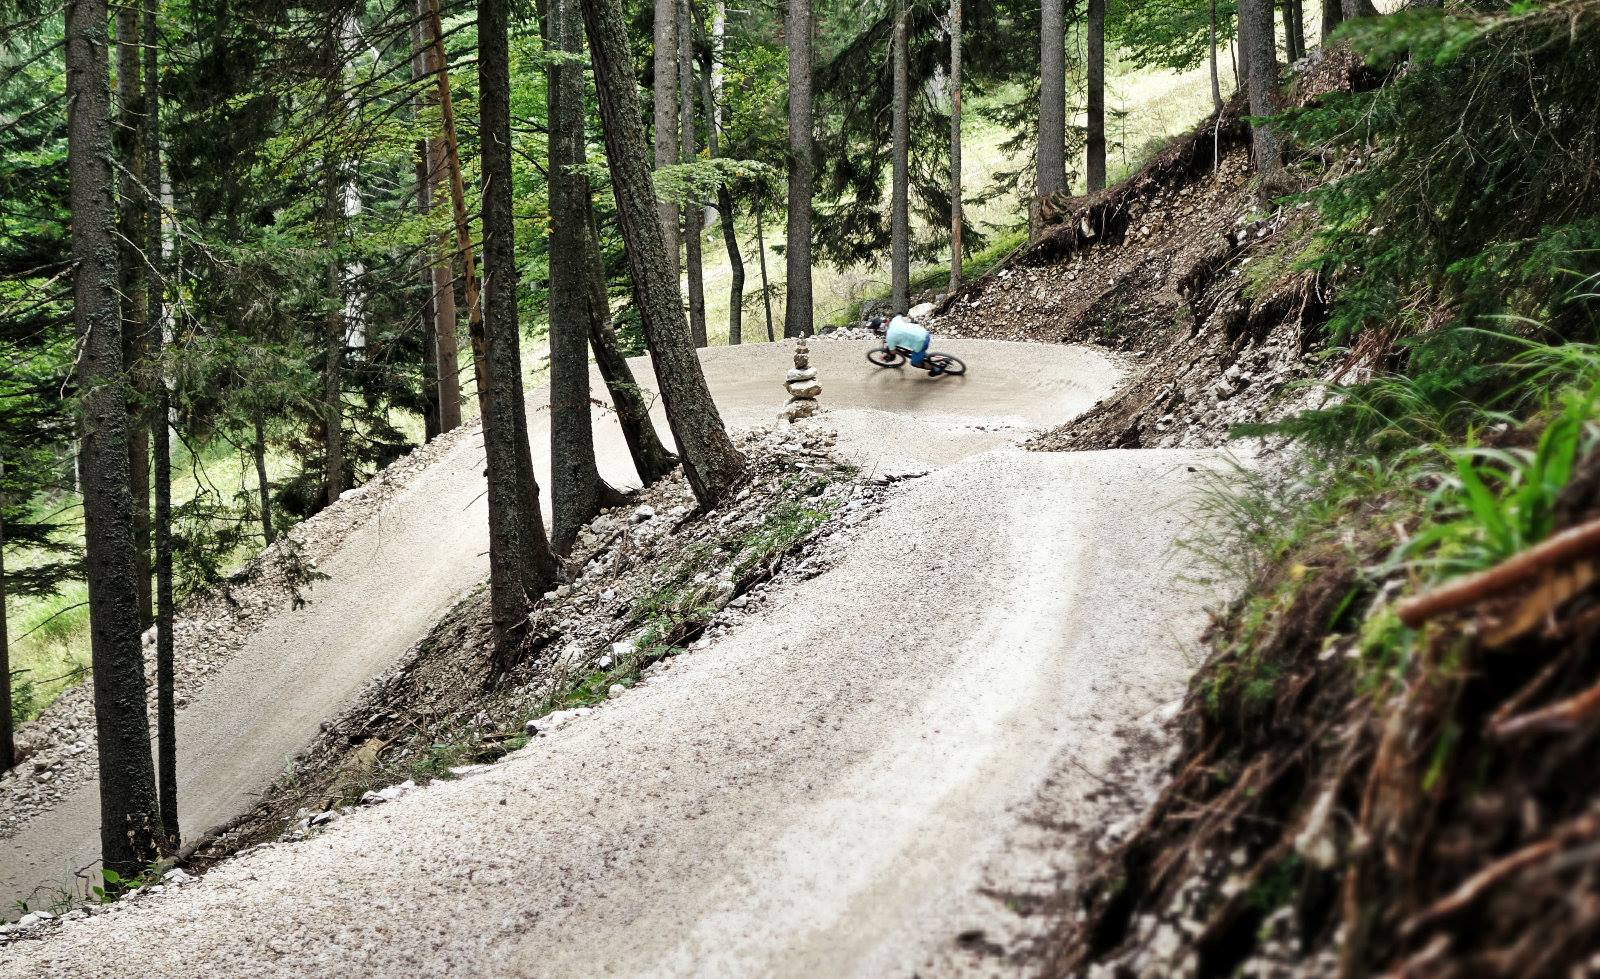 mountainbike-flow-trail.jpg